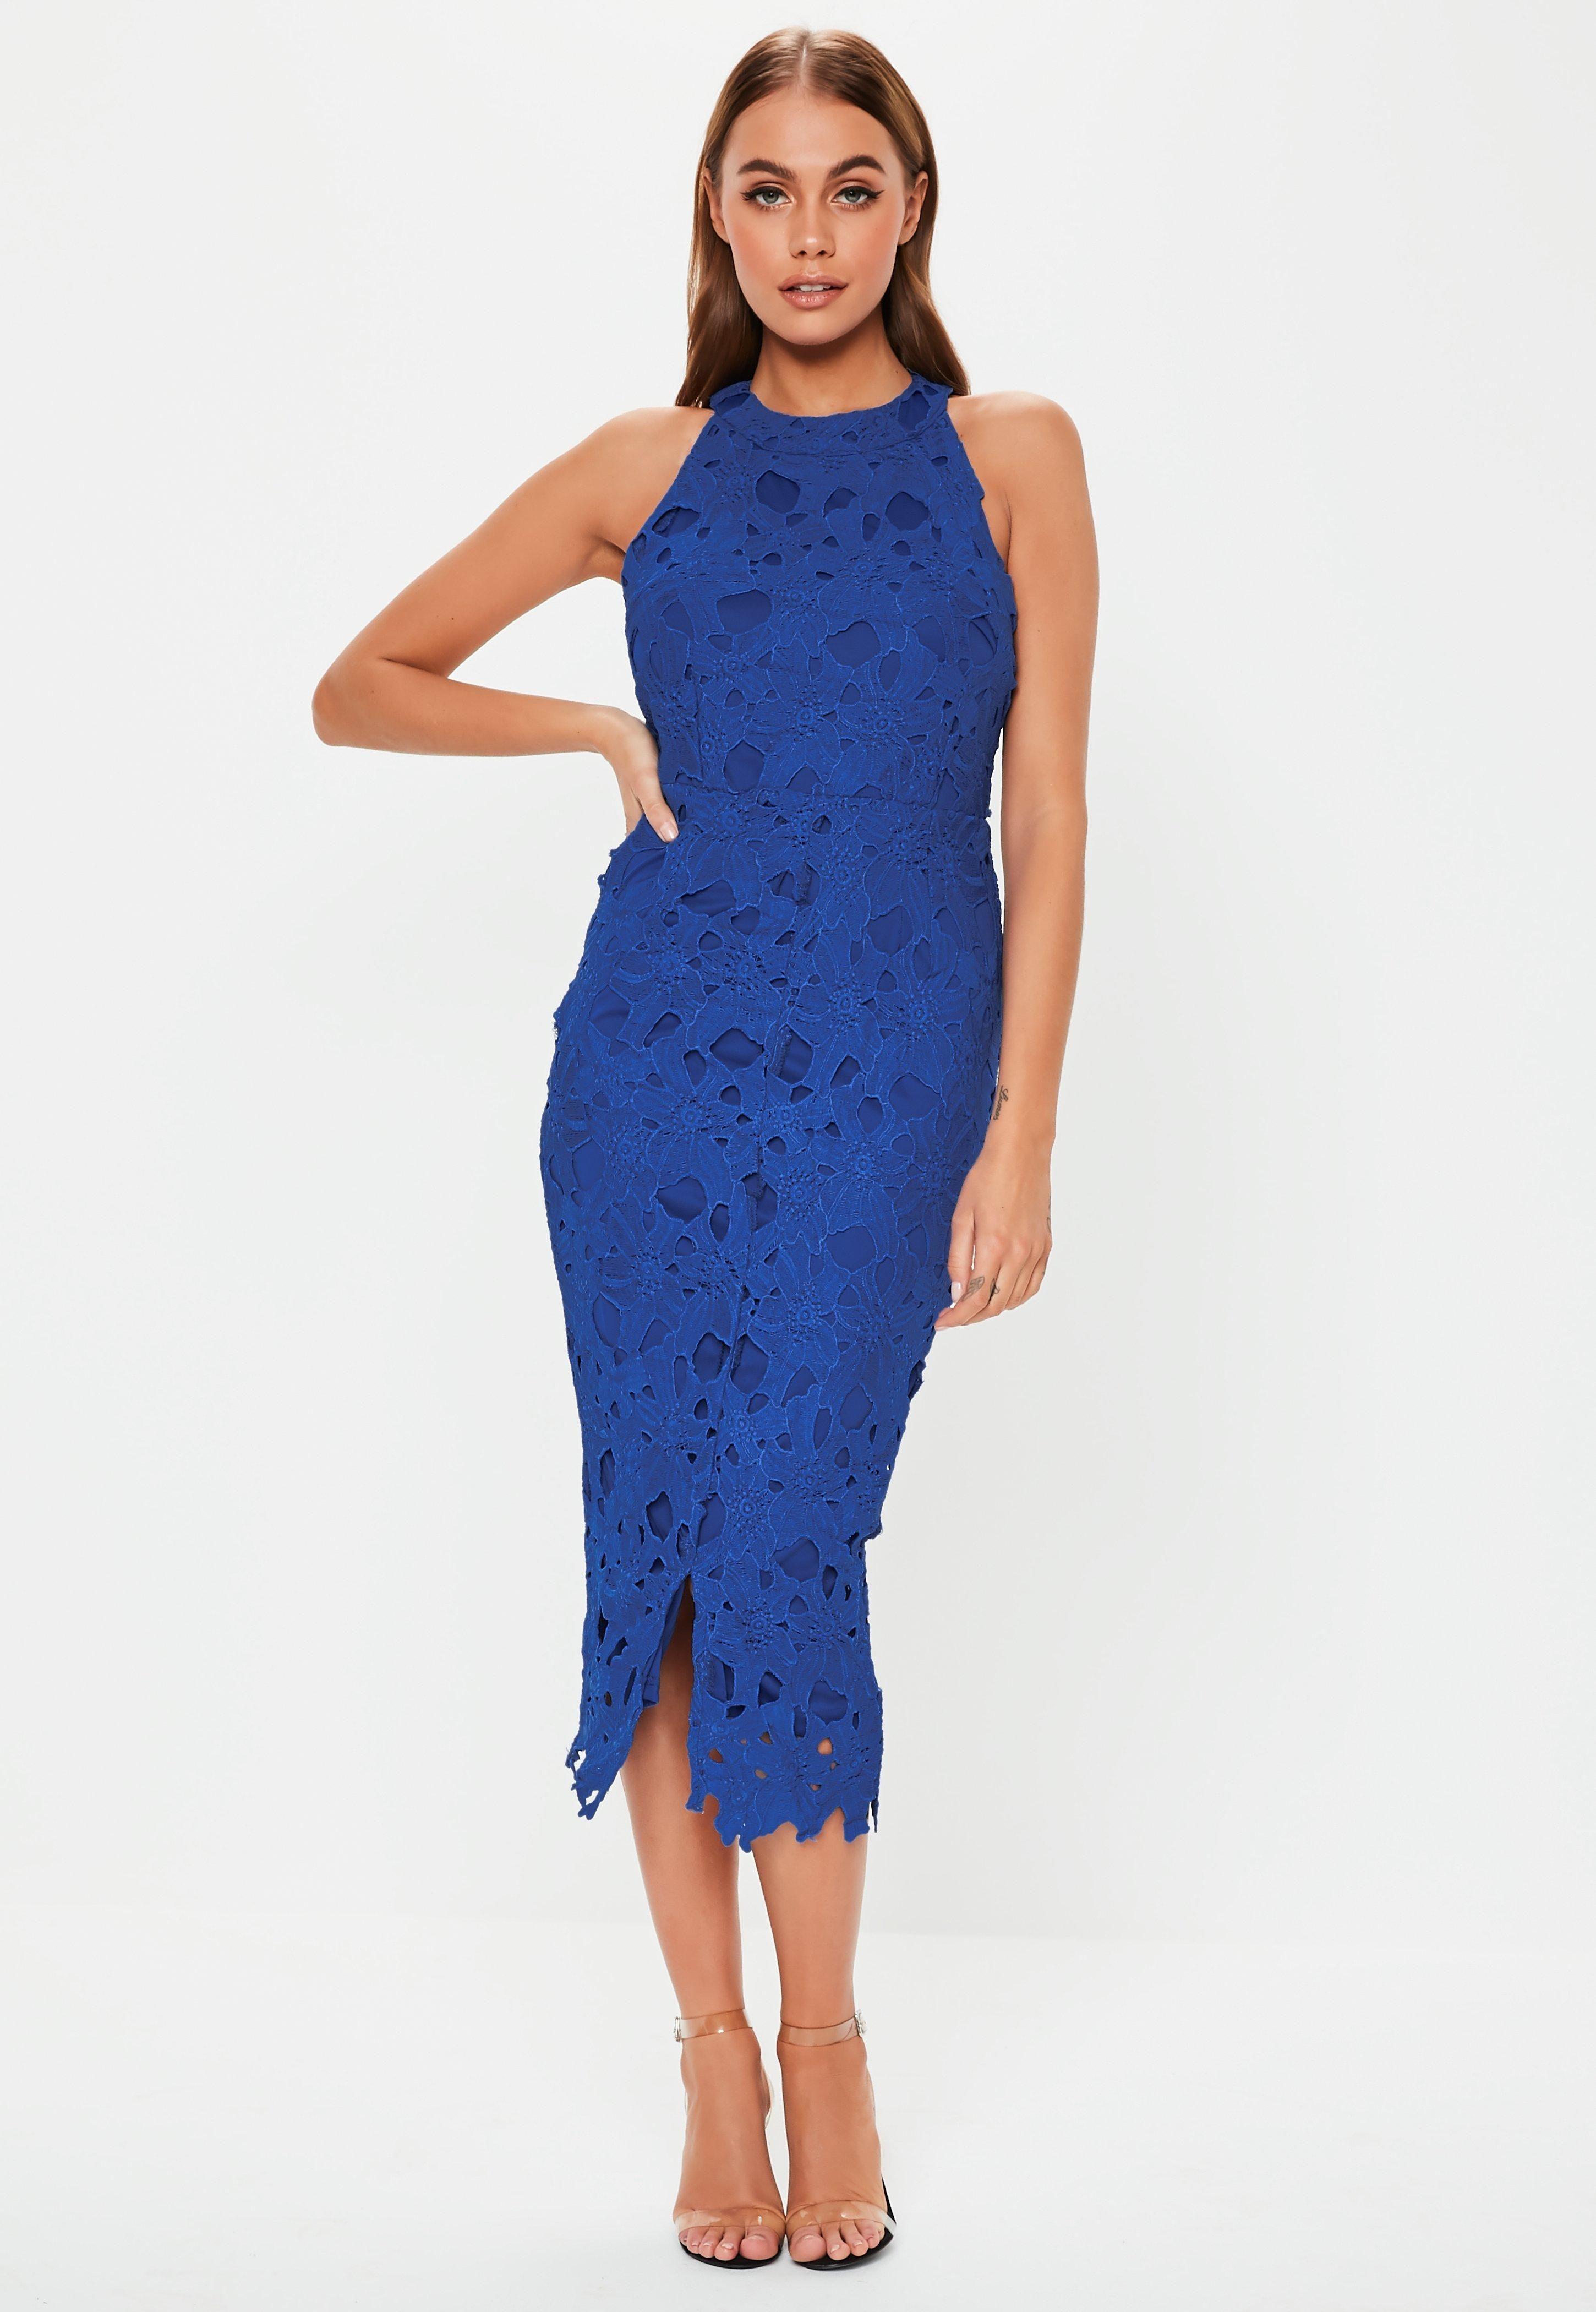 75dba814 Cobalt Blue Lace Halterneck Midi Dress #Sponsored #Lace, #ad, #Blue, #Cobalt